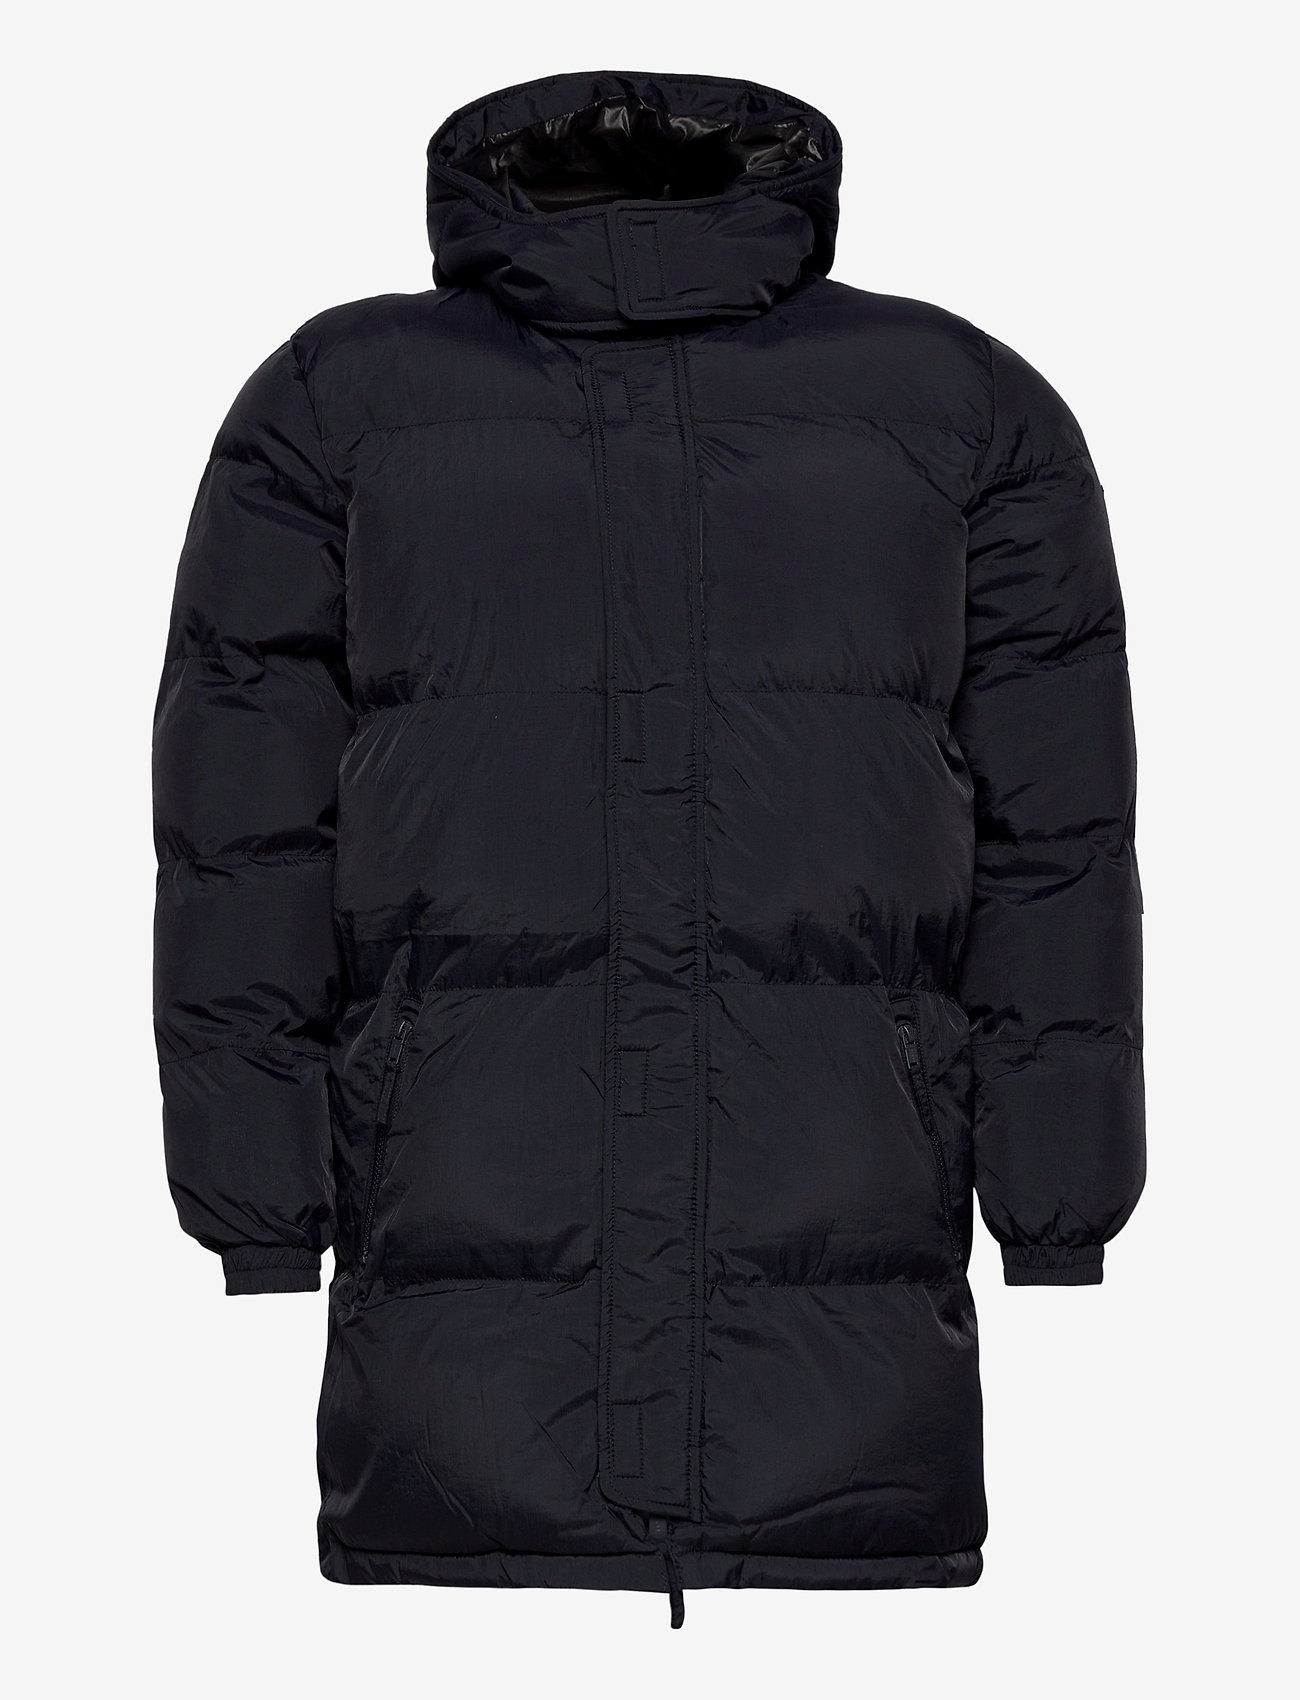 Blend - Outerwear - padded jackets - dark navy - 1